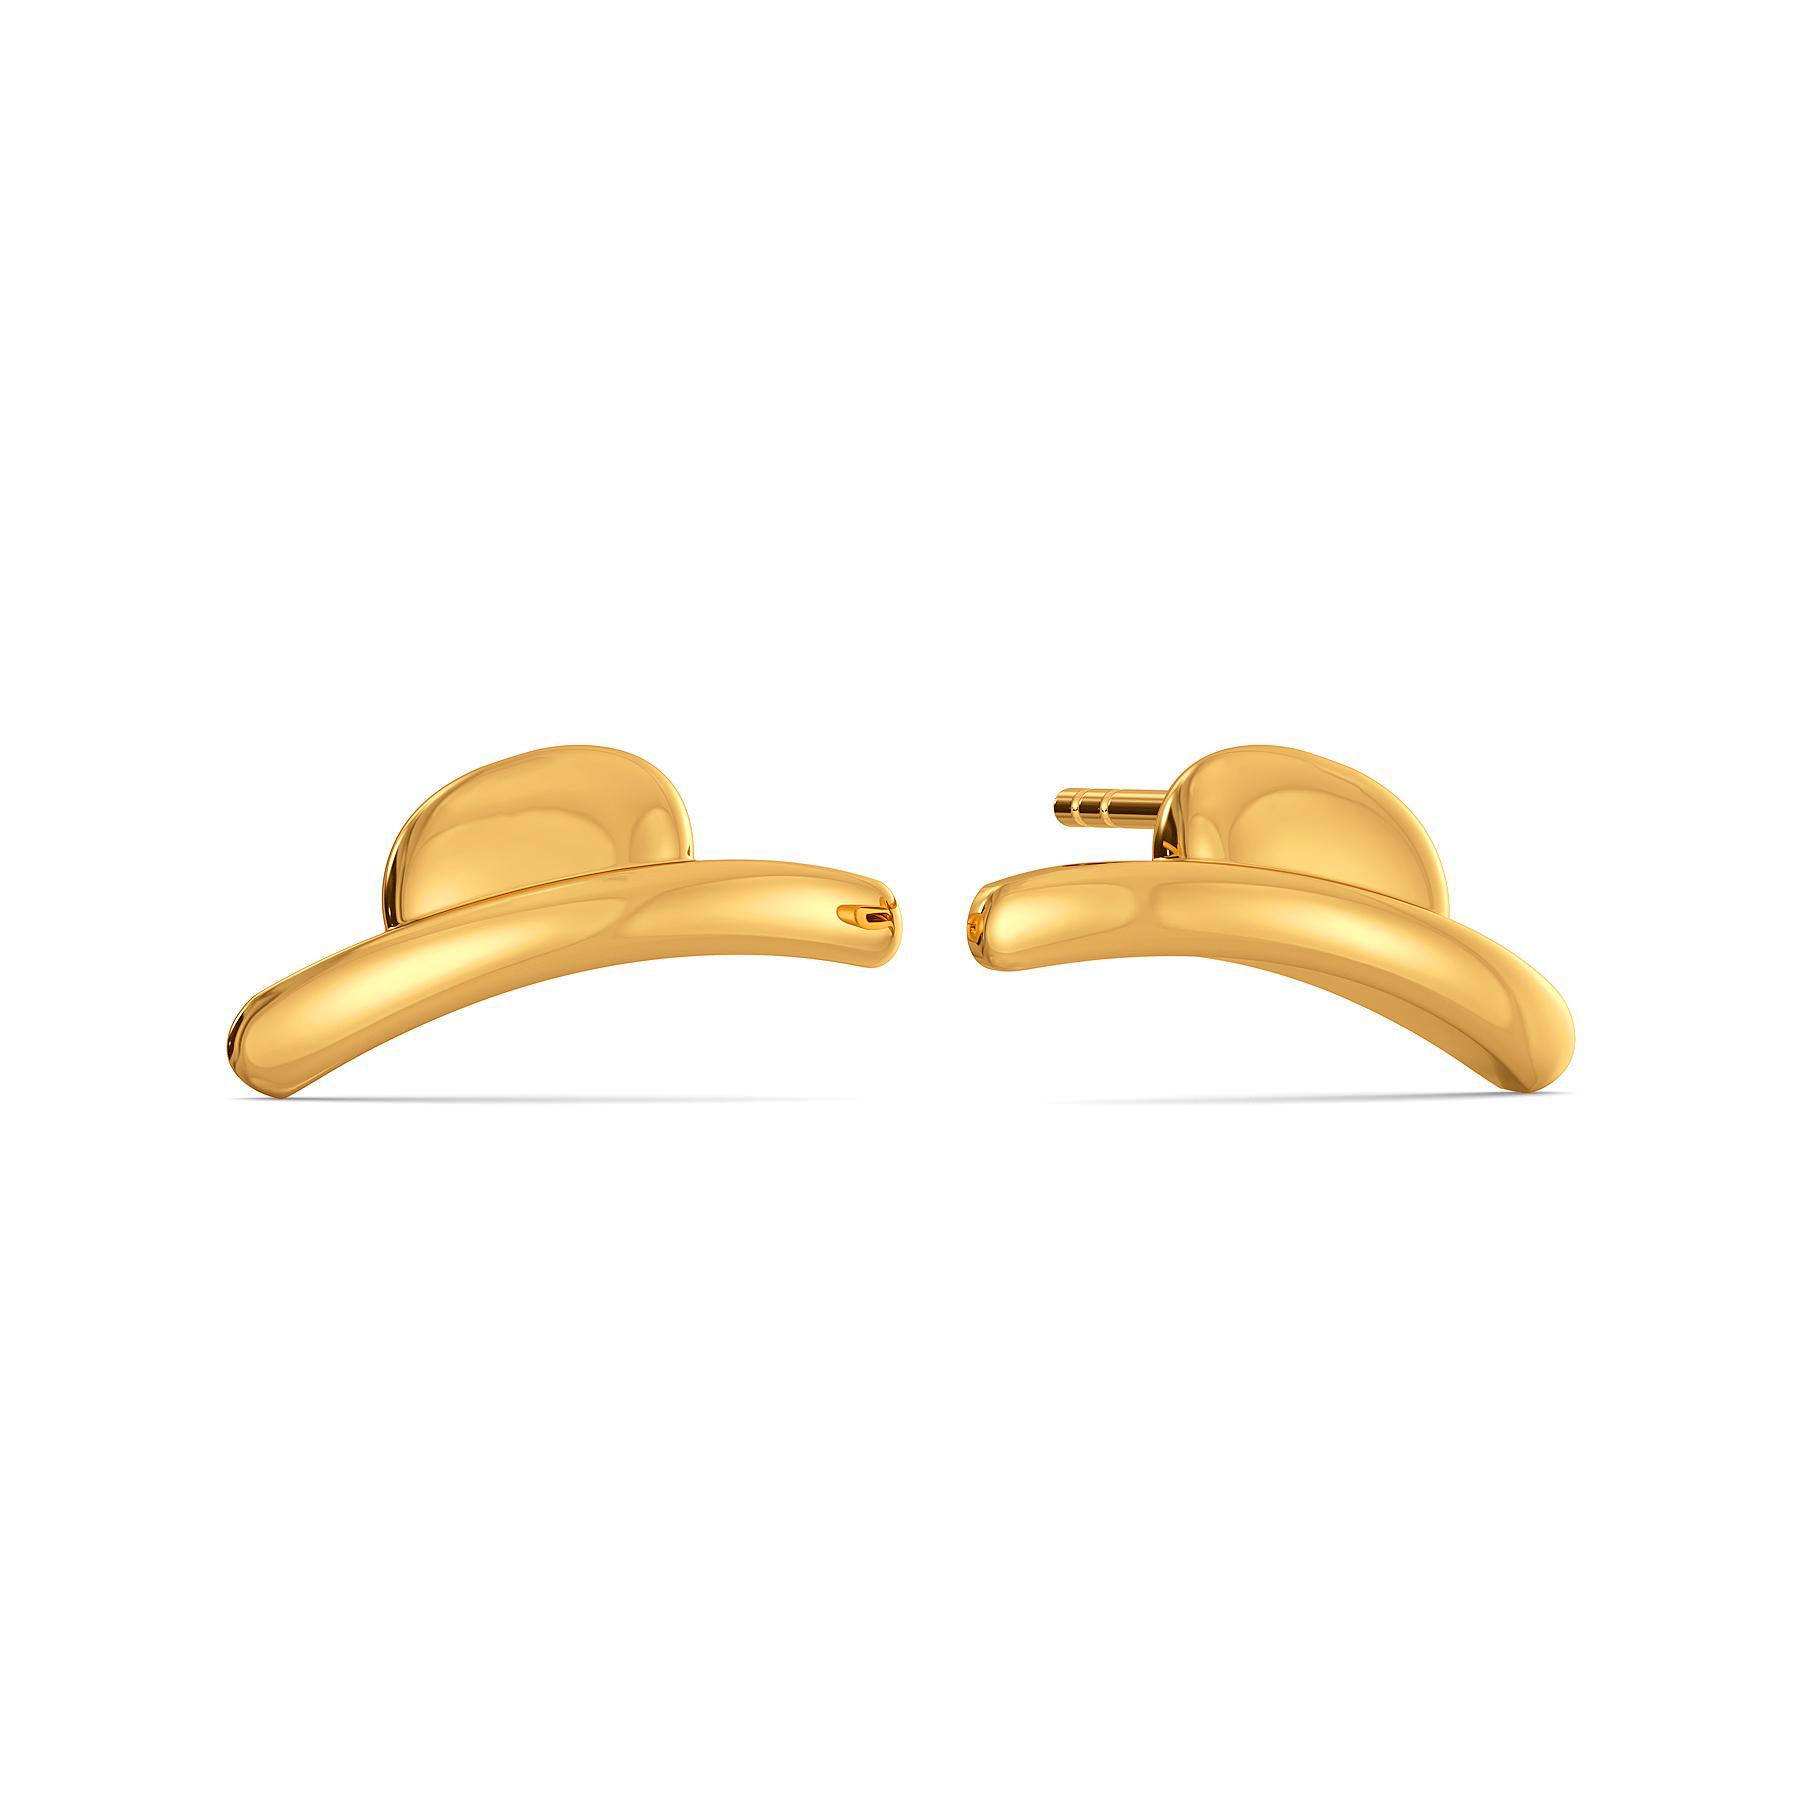 Playful Hats Gold Earrings